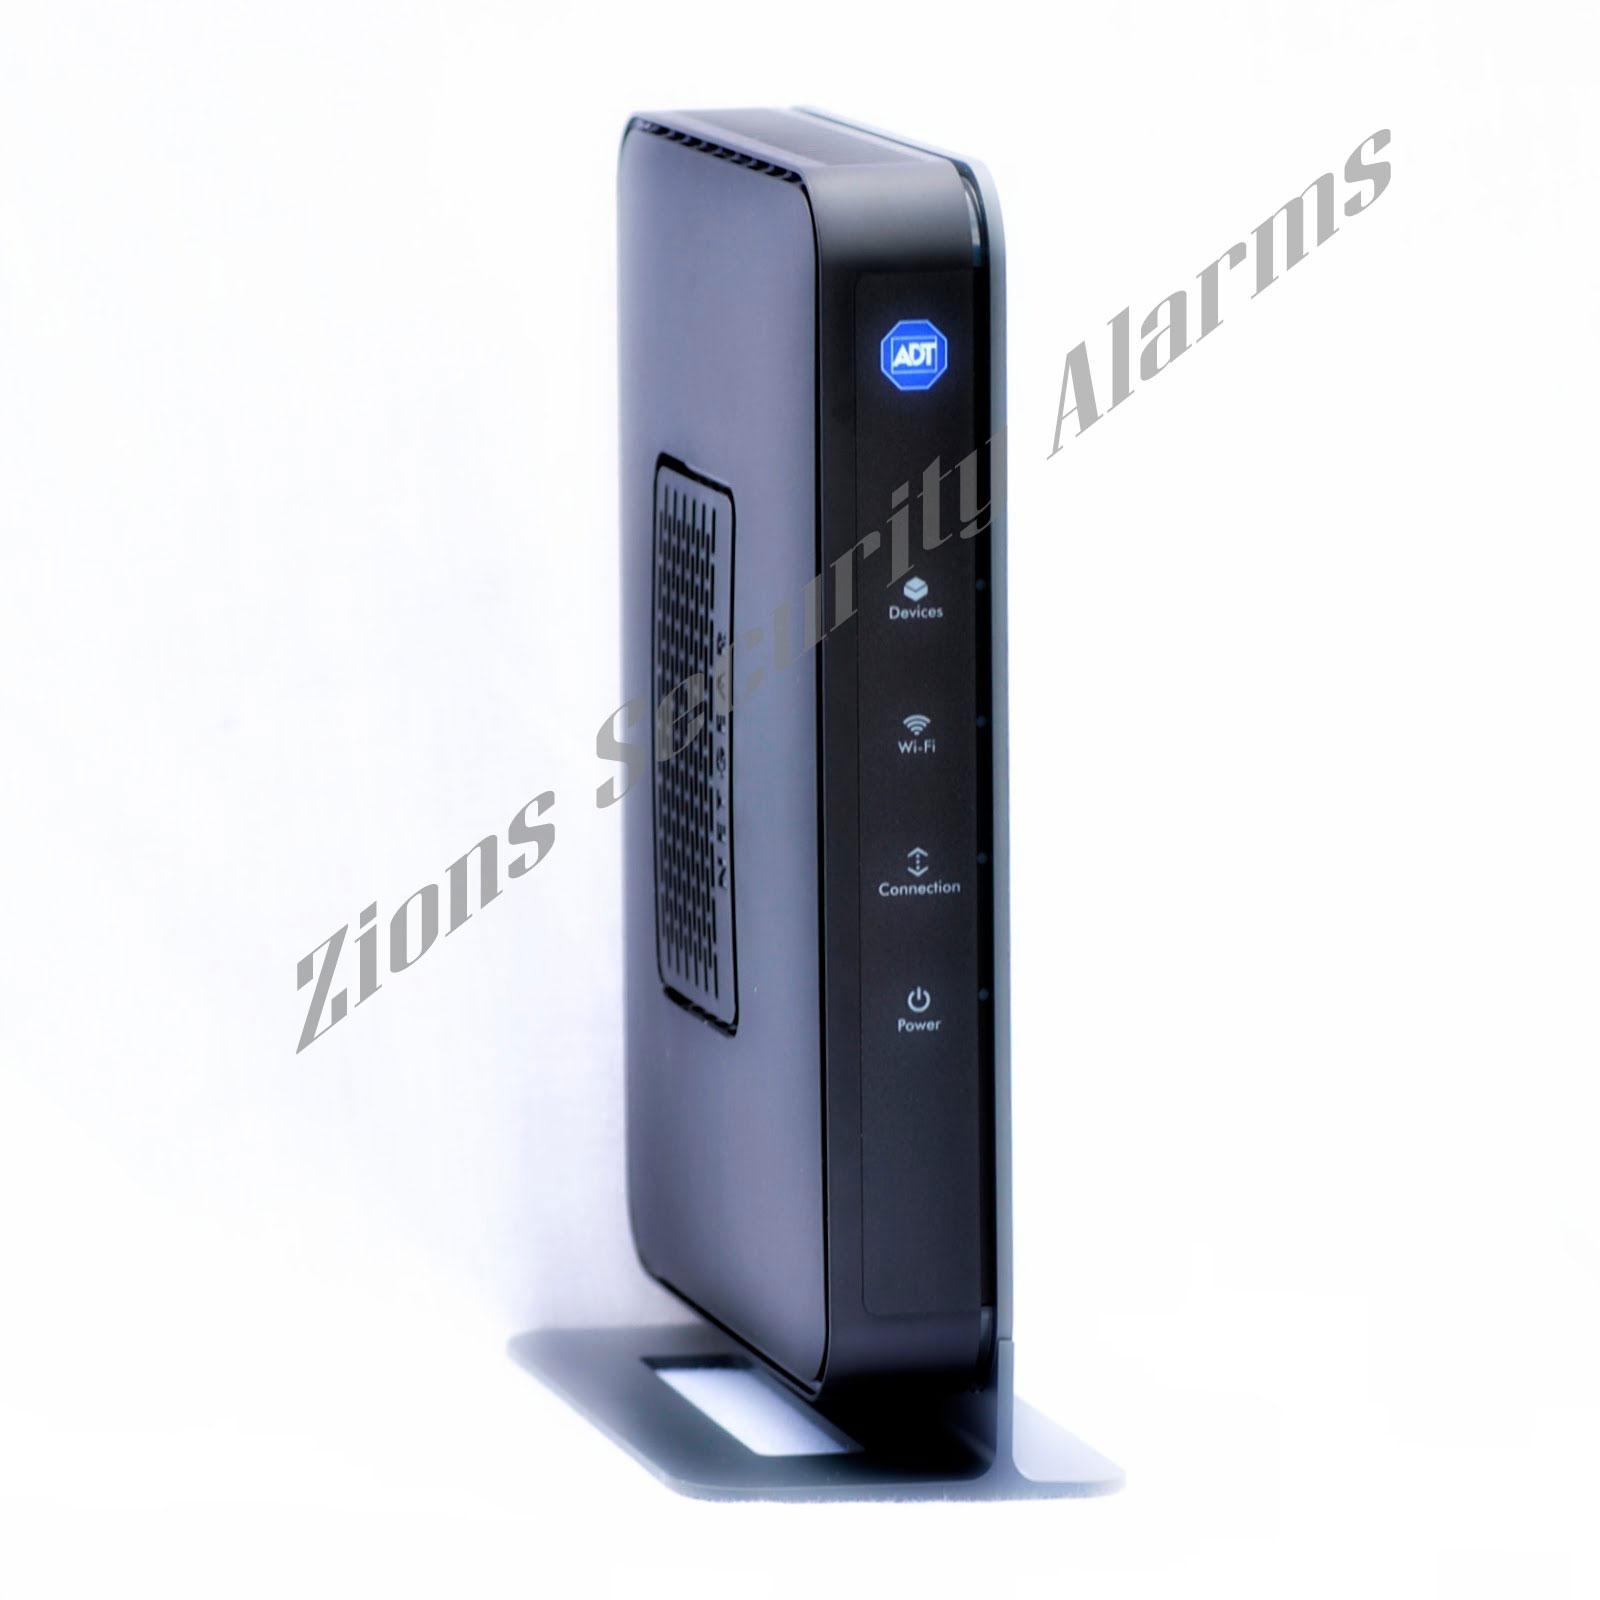 Adt Pulse Wifi Range Extender Zions Security Adt